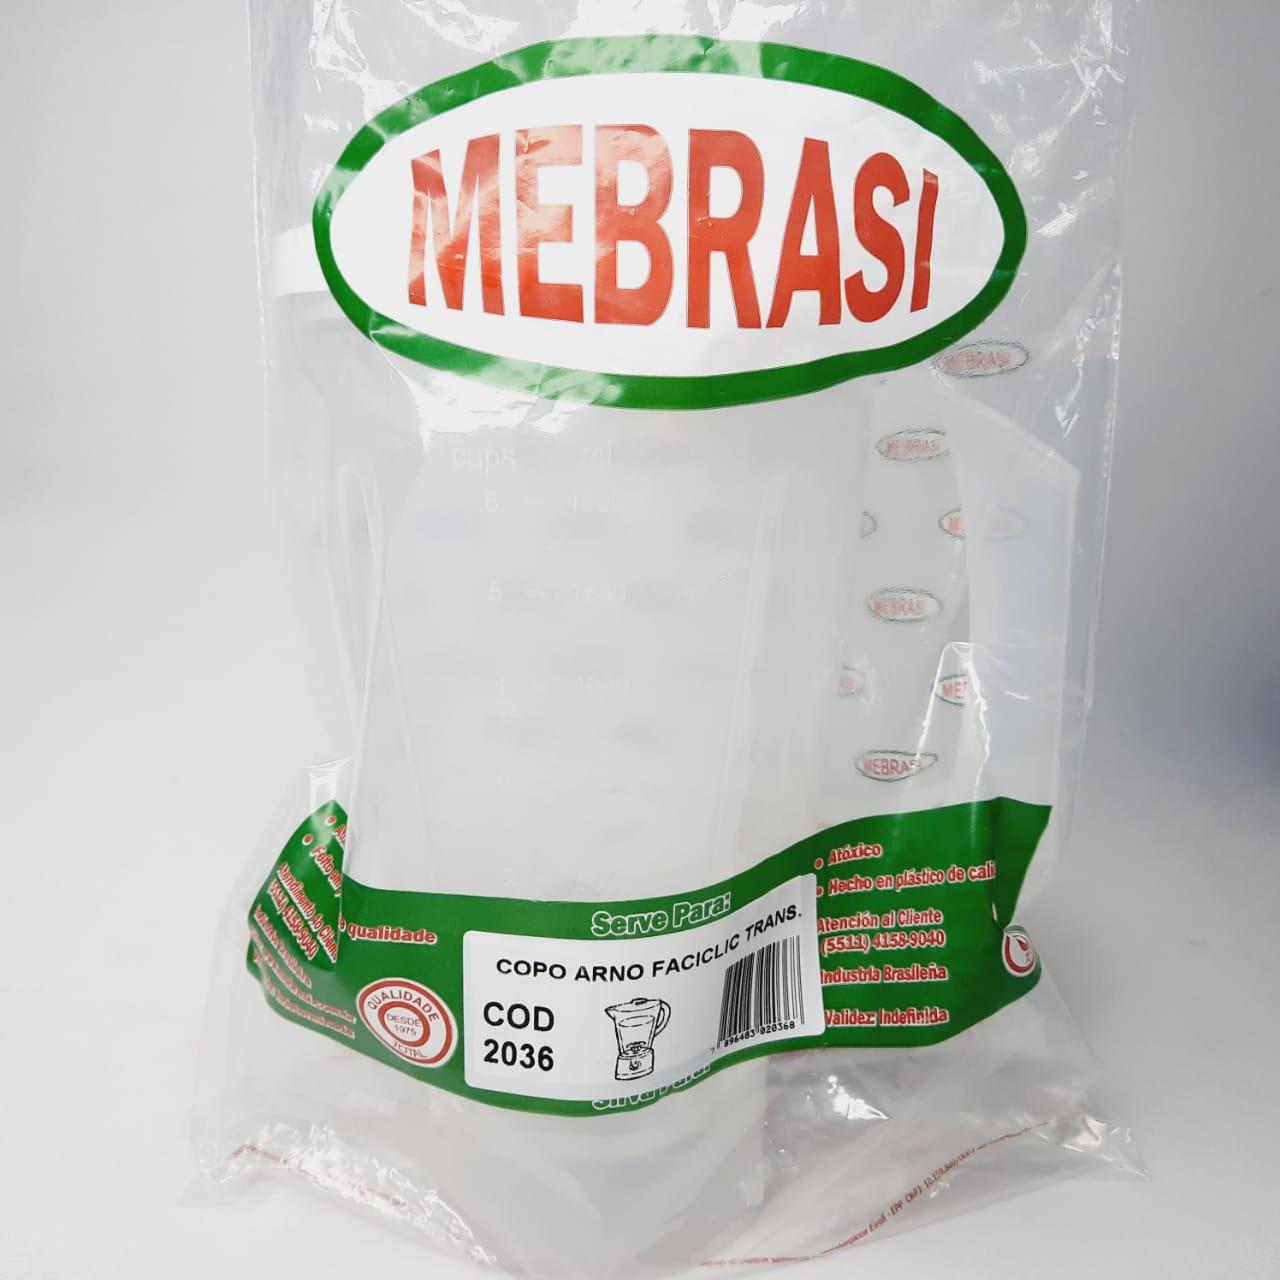 Copo Arno Translúcido Faciclic - Mebrasi